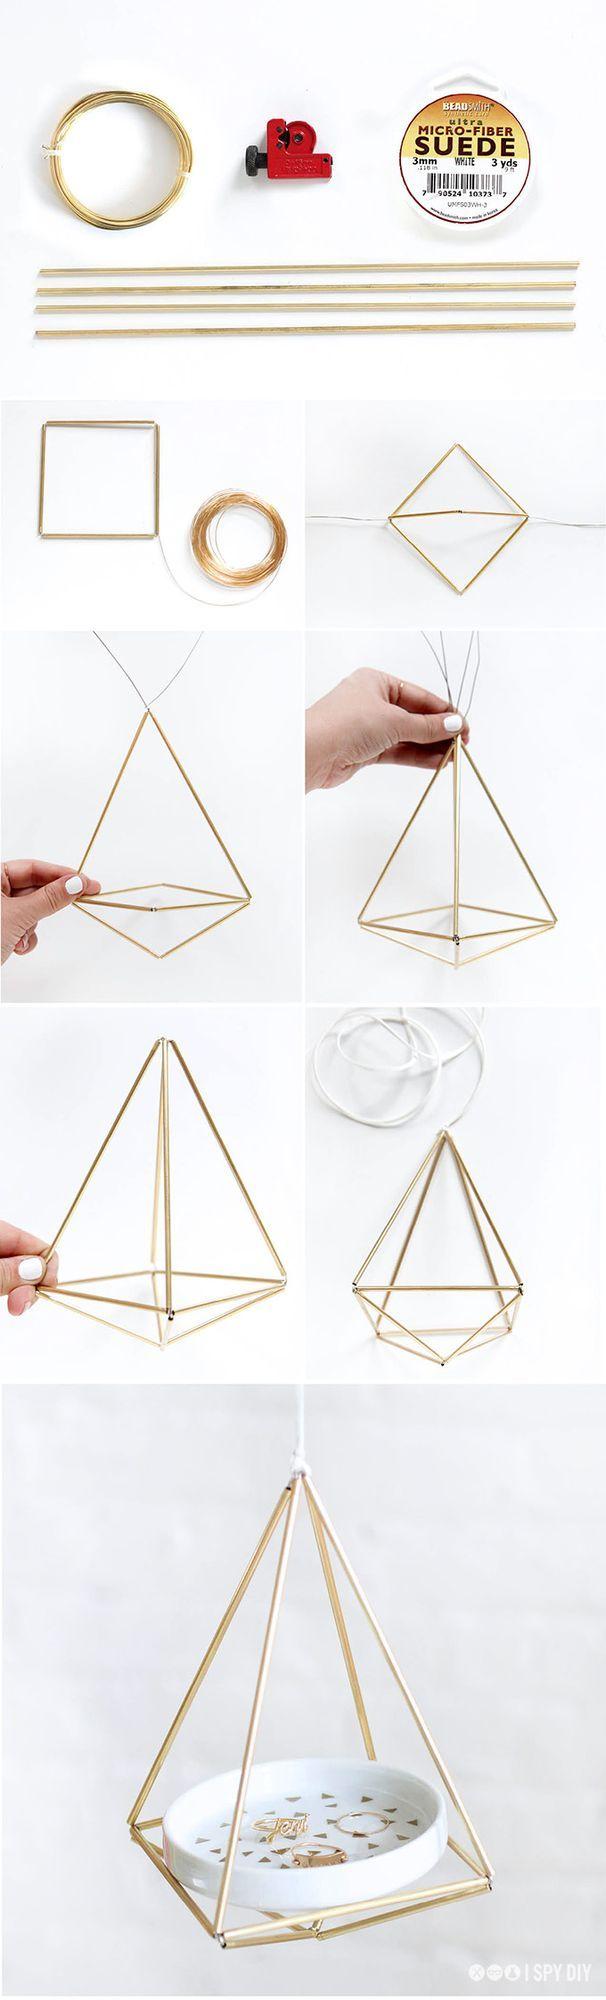 DIY KIT | Brass Himmeli Hanger | I Spy DIY | Bloglovin'